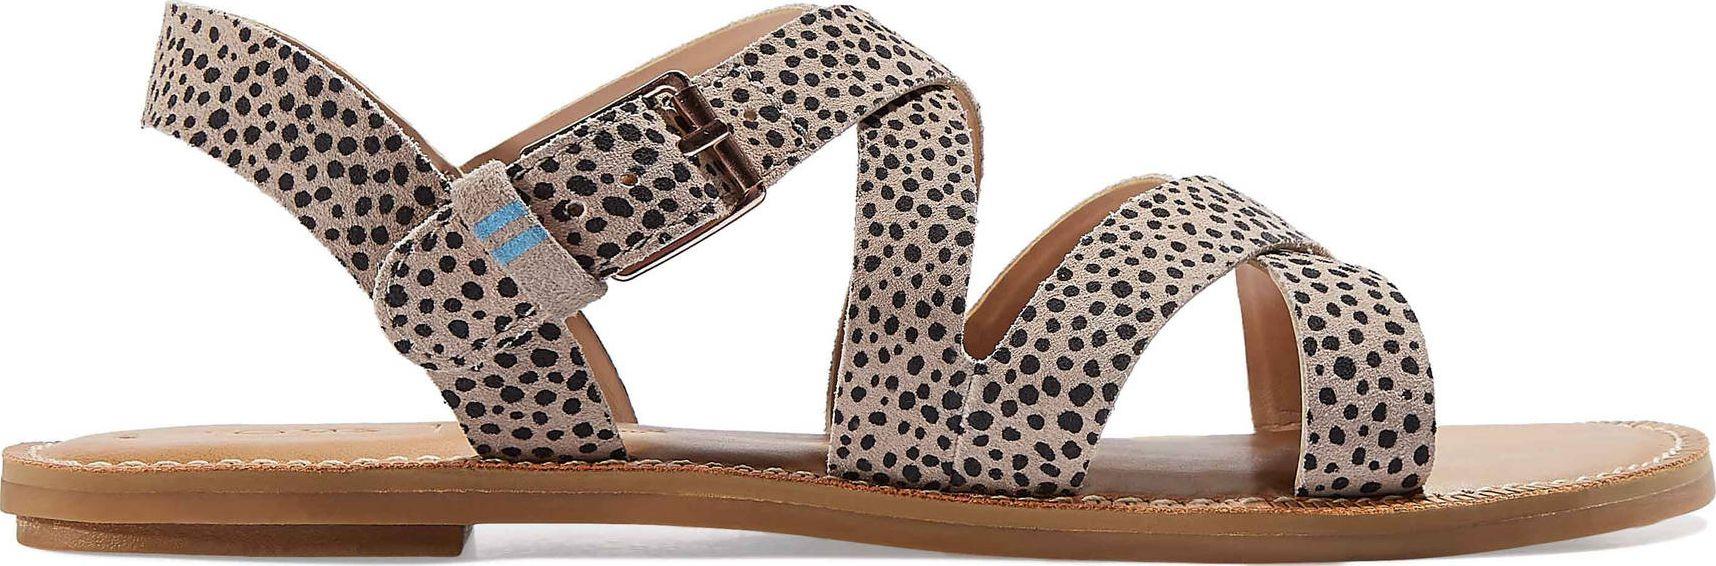 TOMS Mini Cheetah Suede Women's Sicily Sandal Macadamia 42